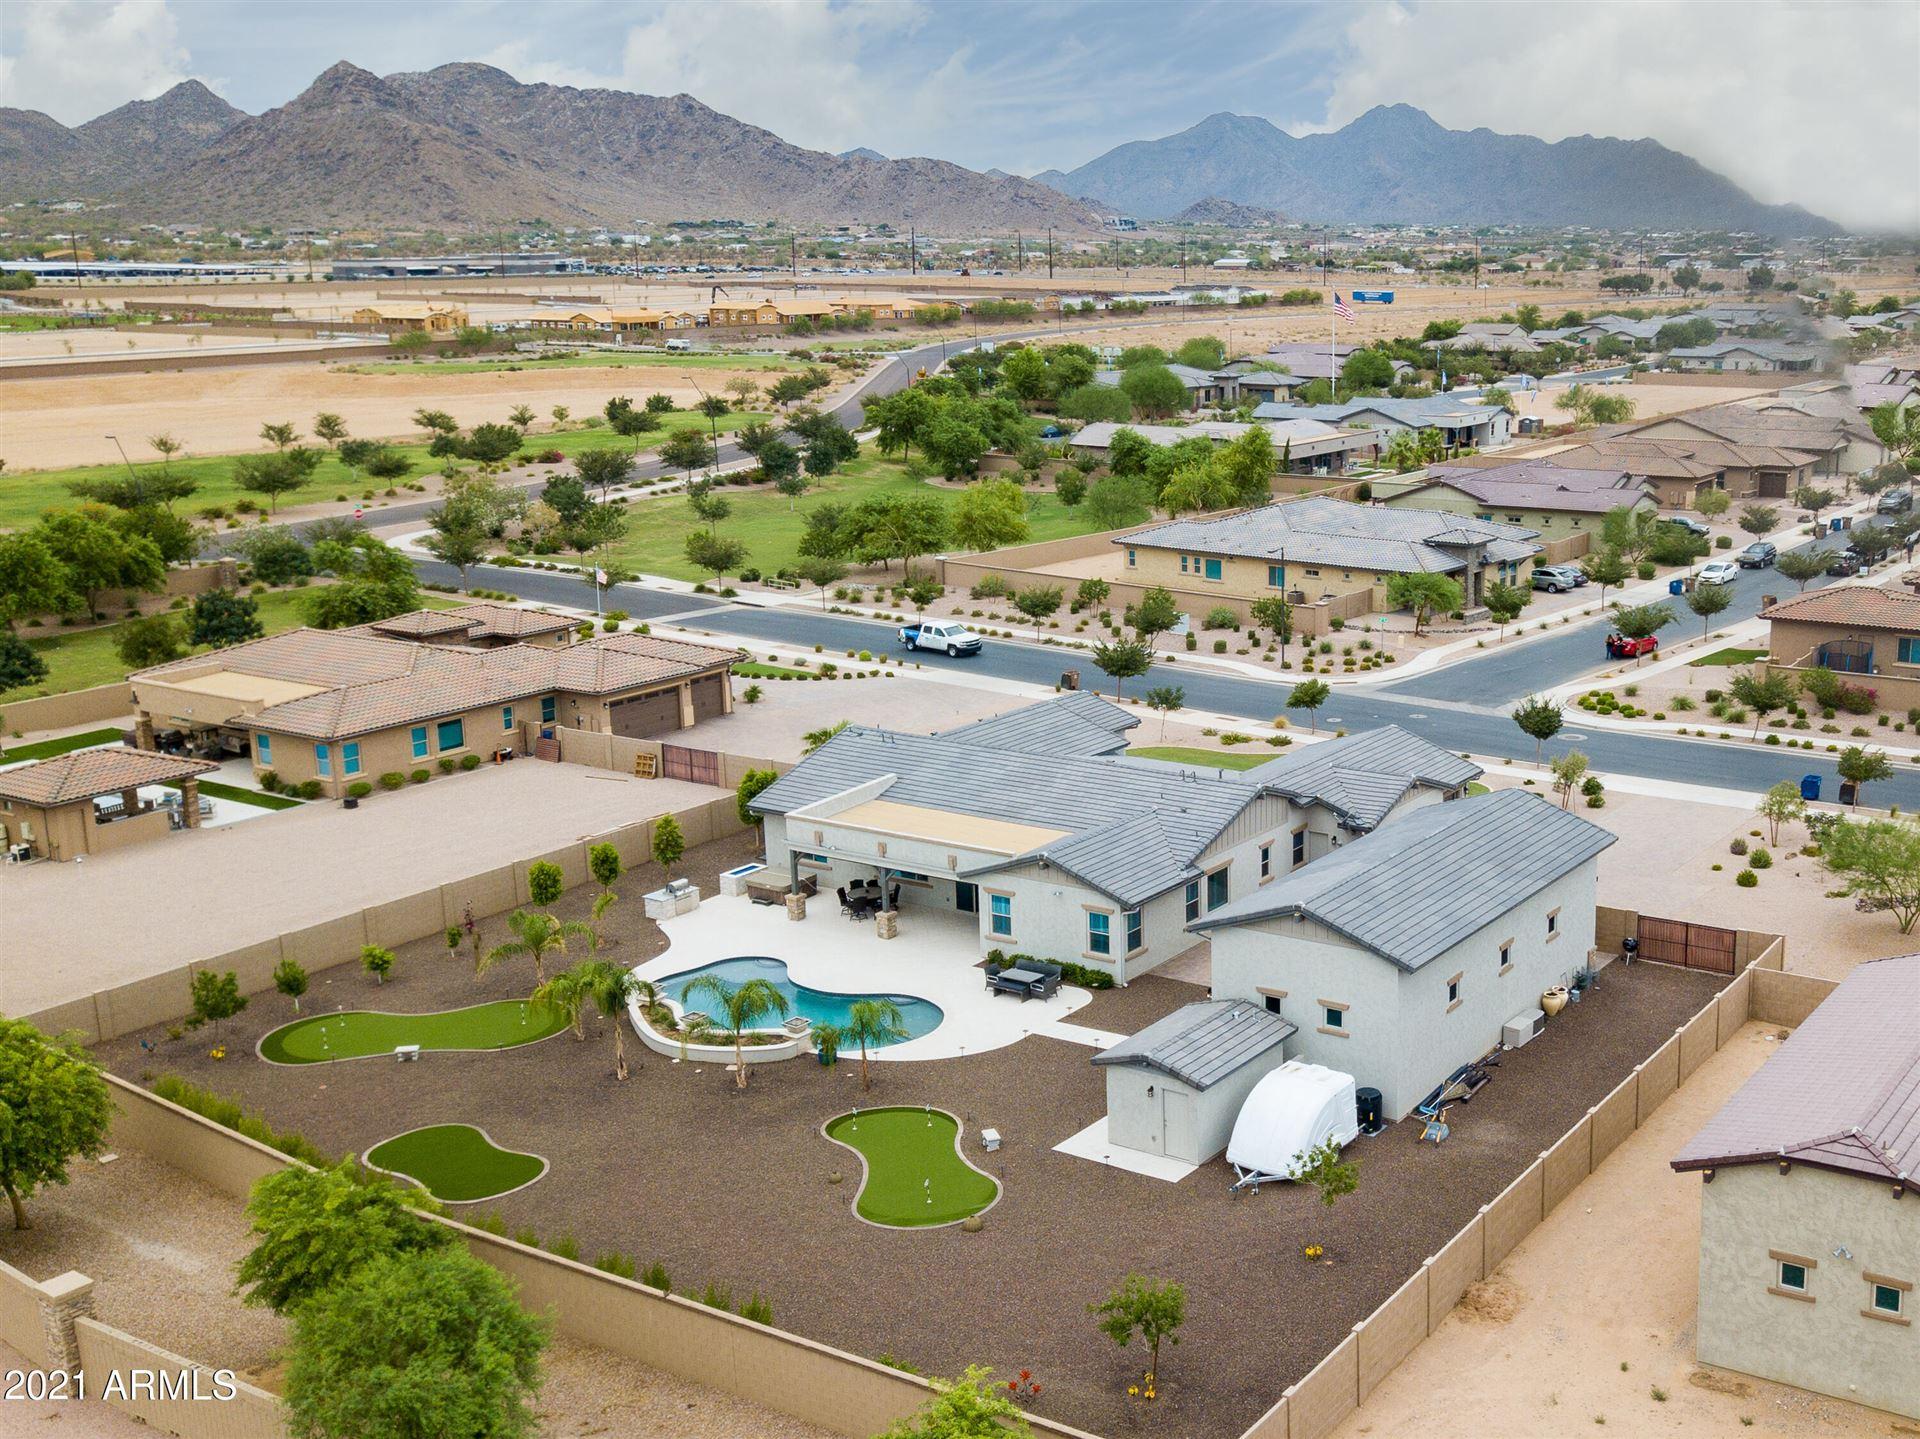 Photo of 26163 S 211TH Place, Queen Creek, AZ 85142 (MLS # 6268449)